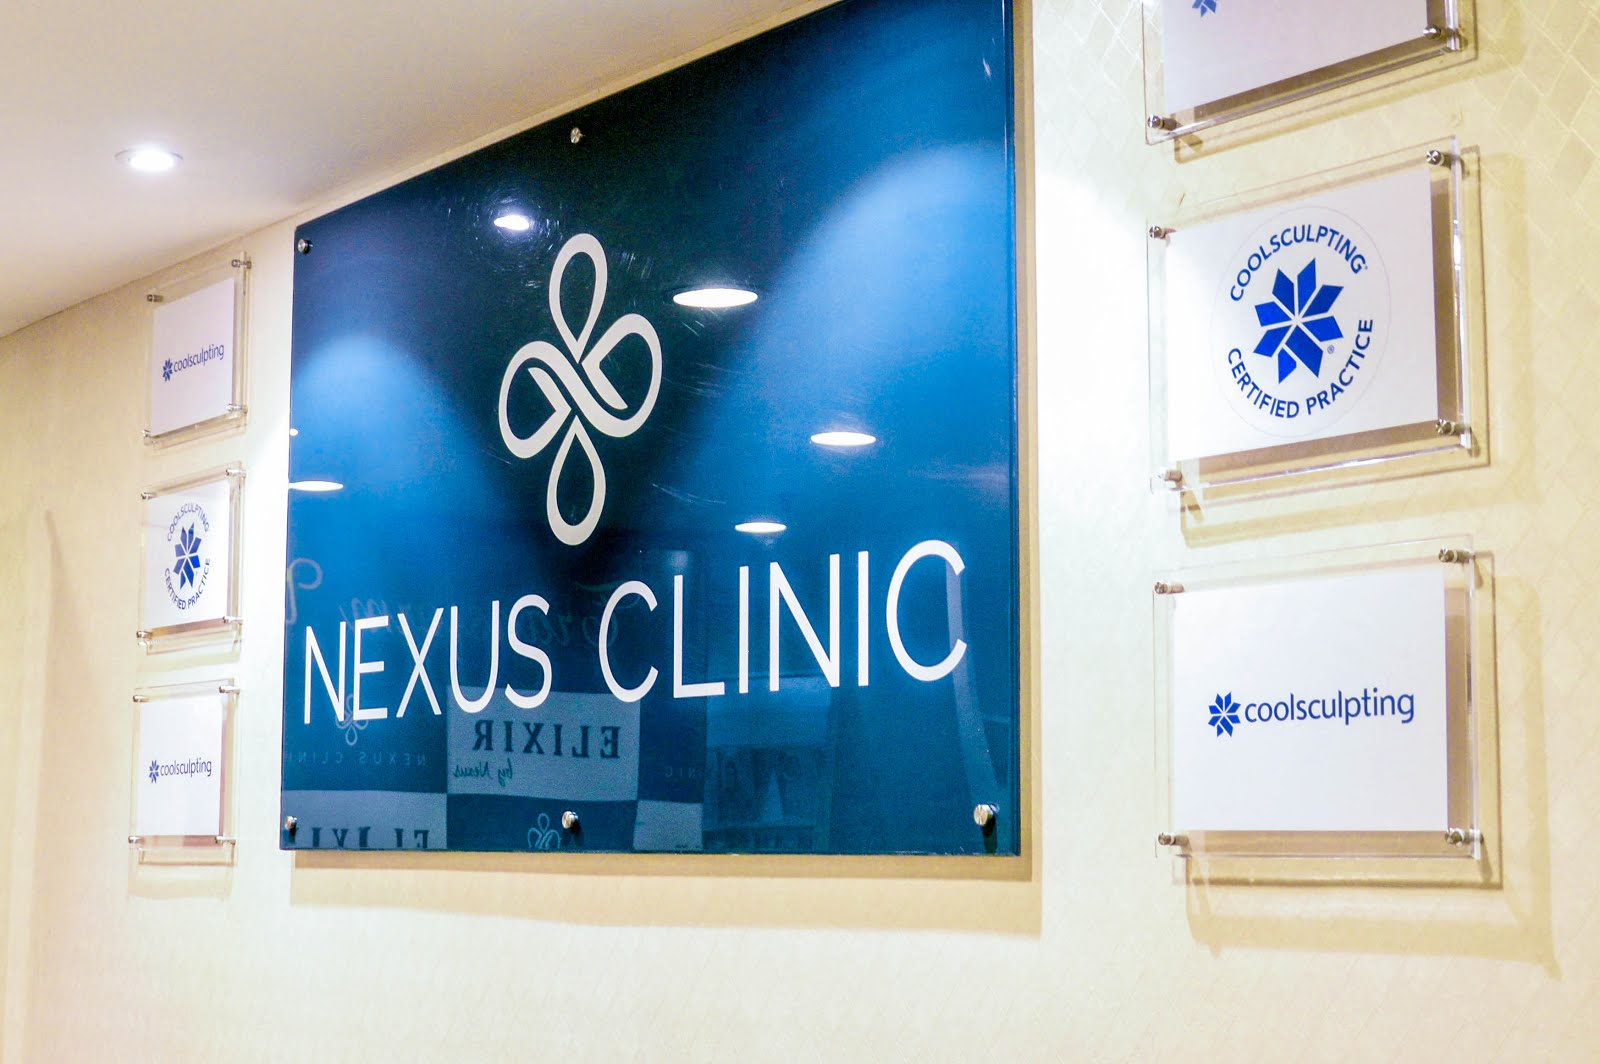 nexus clinic malaysia review